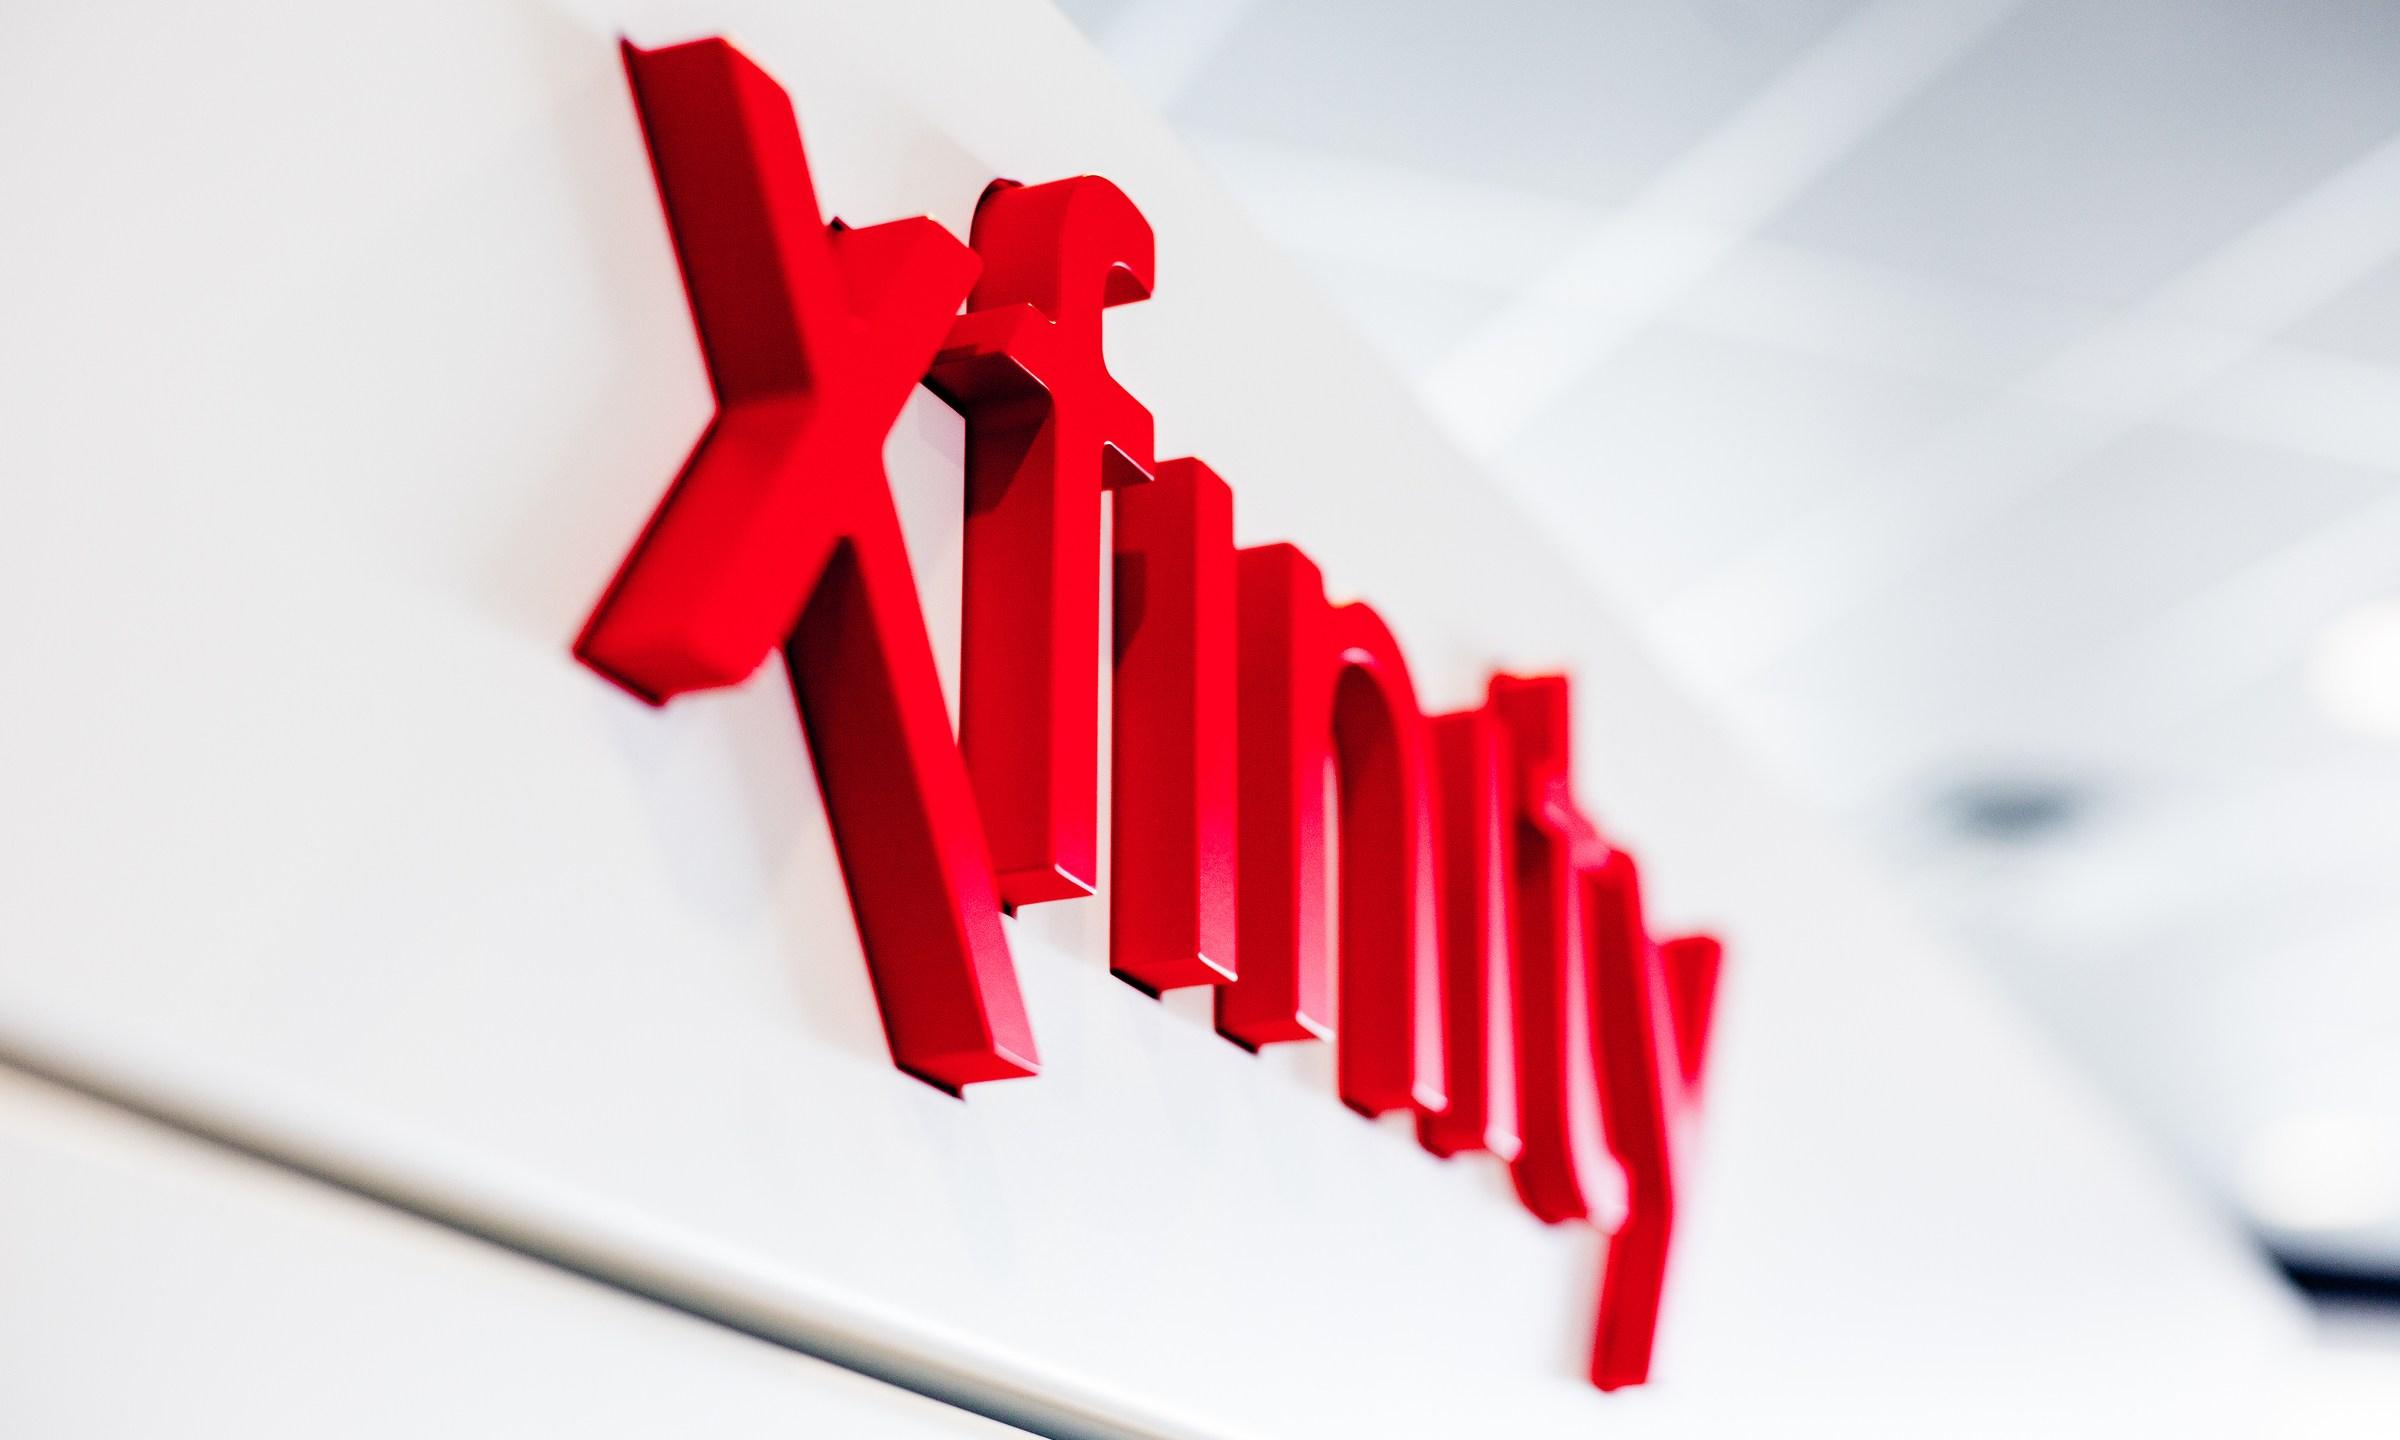 Xfinity Store - Havertown203.JPG_1551726496113